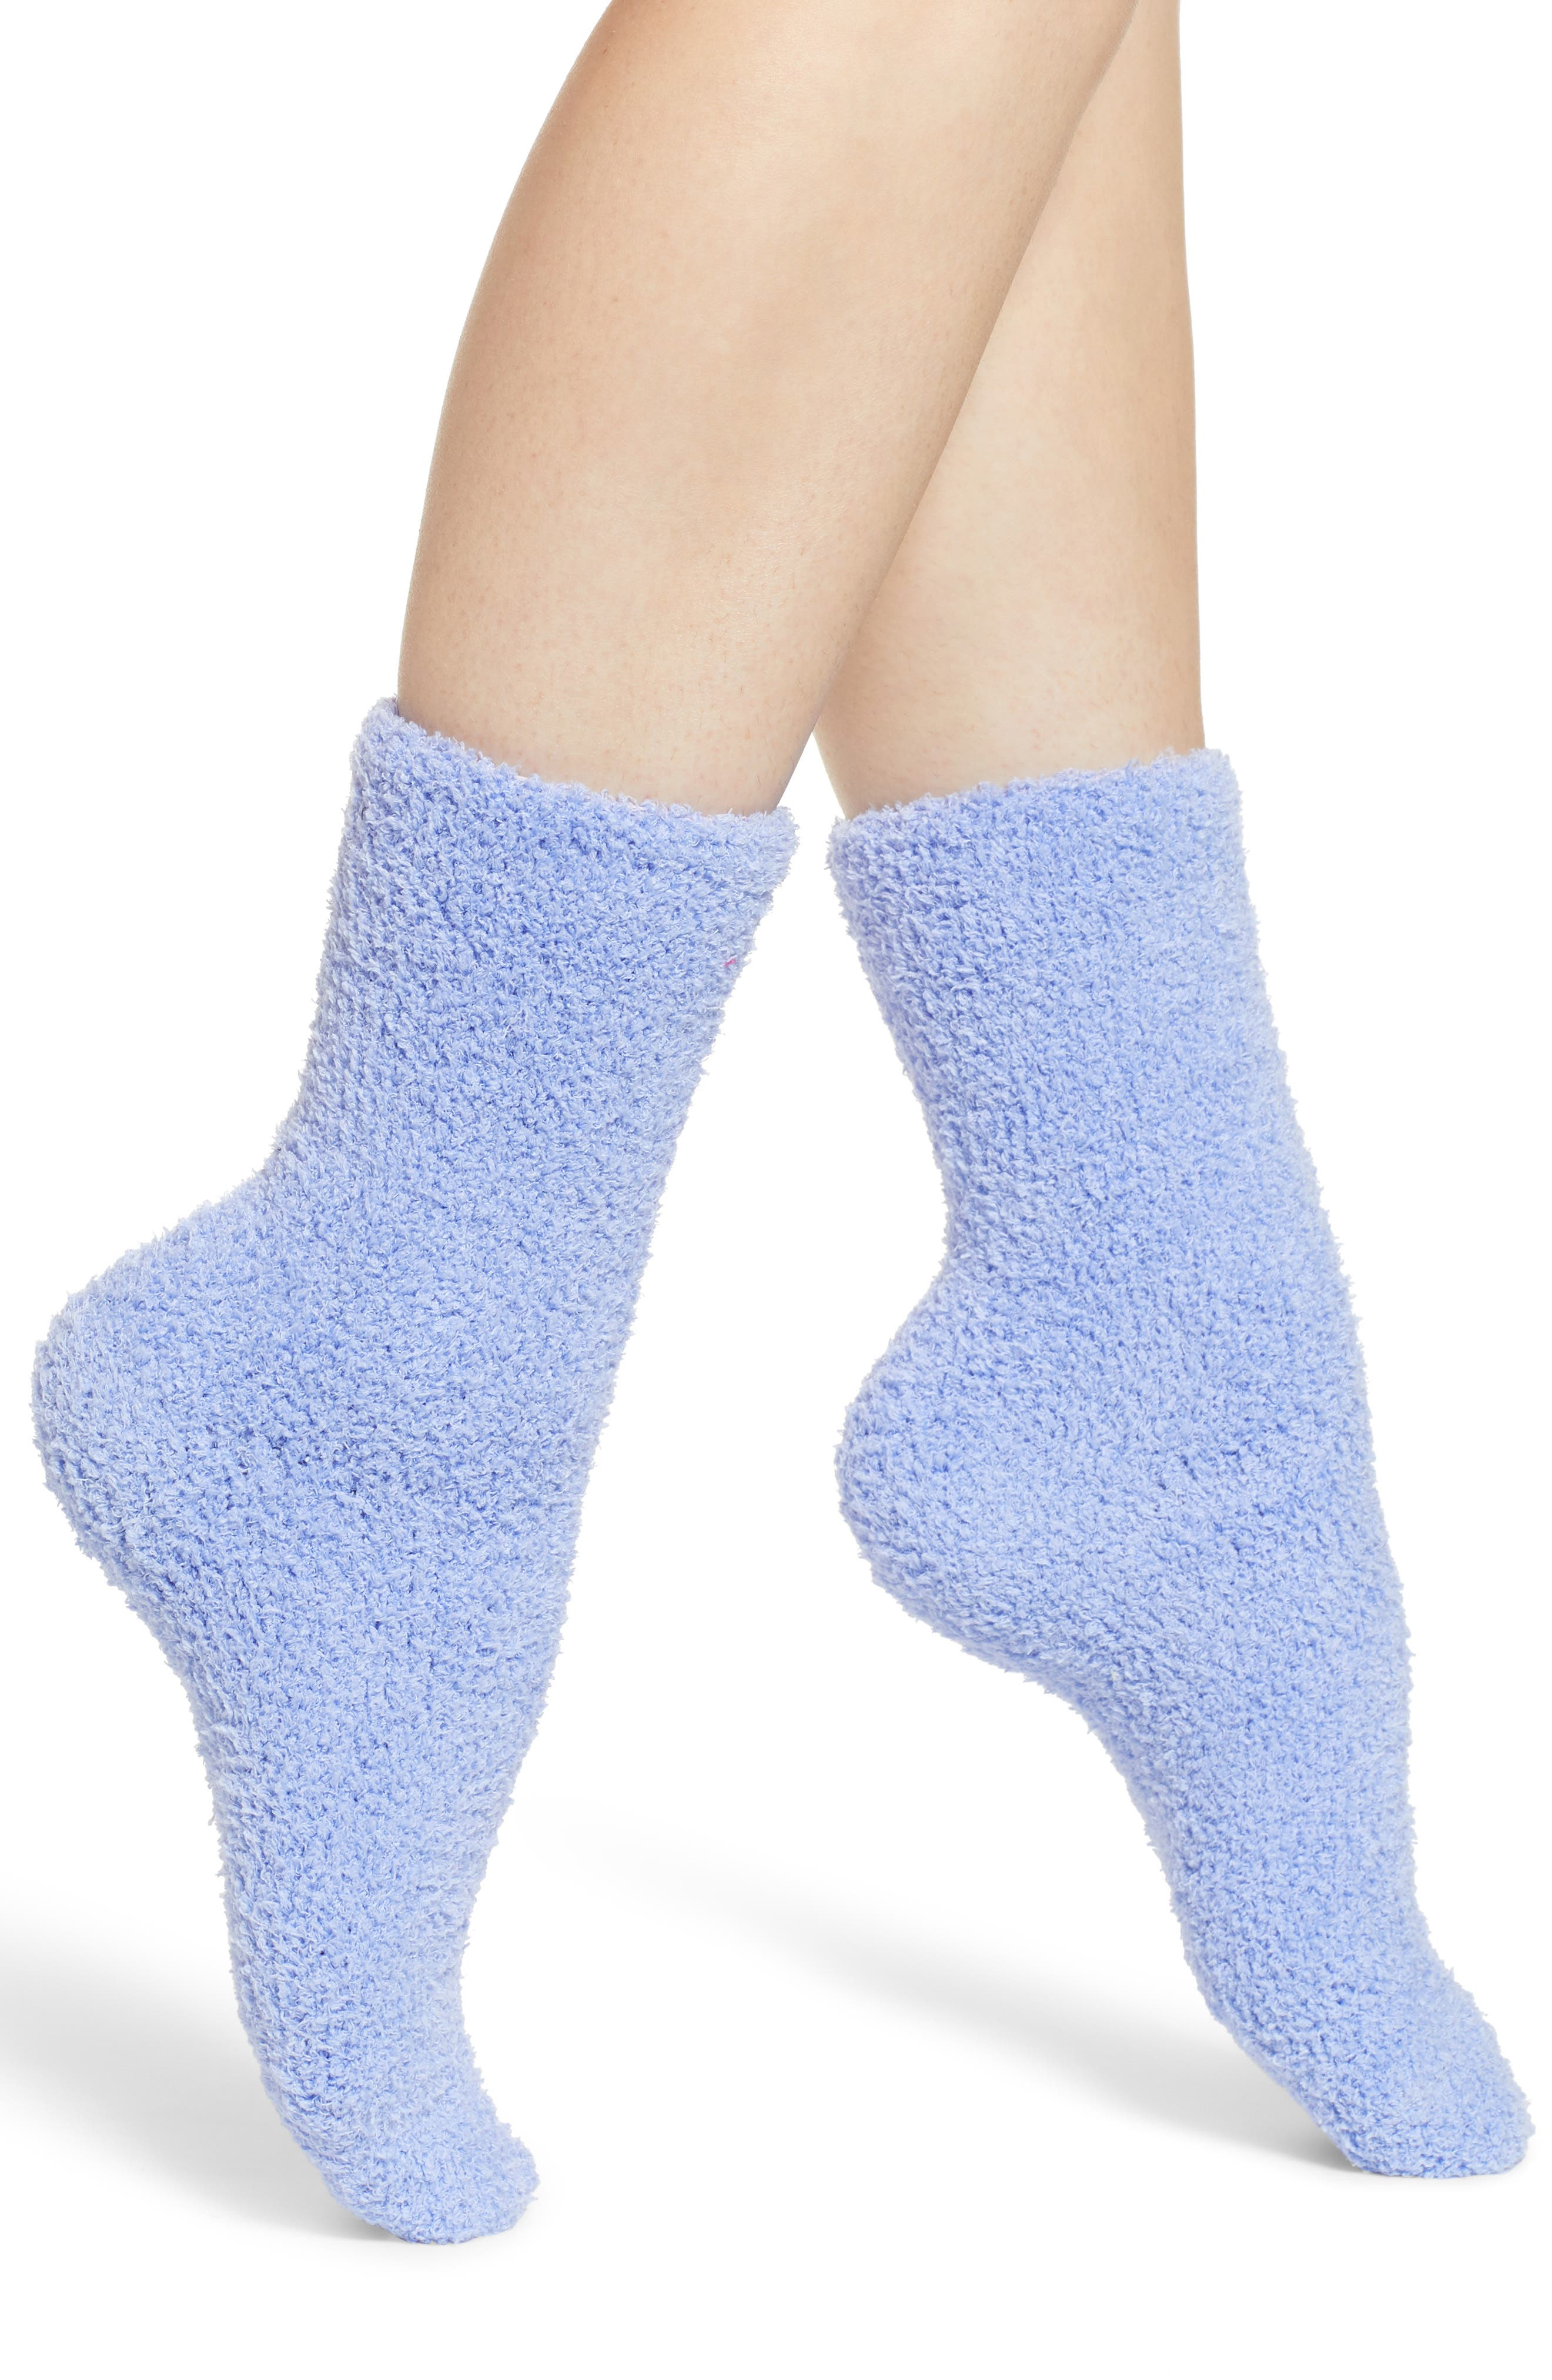 Butter Crew Socks,                         Main,                         color, BLUE HYDRANGEA